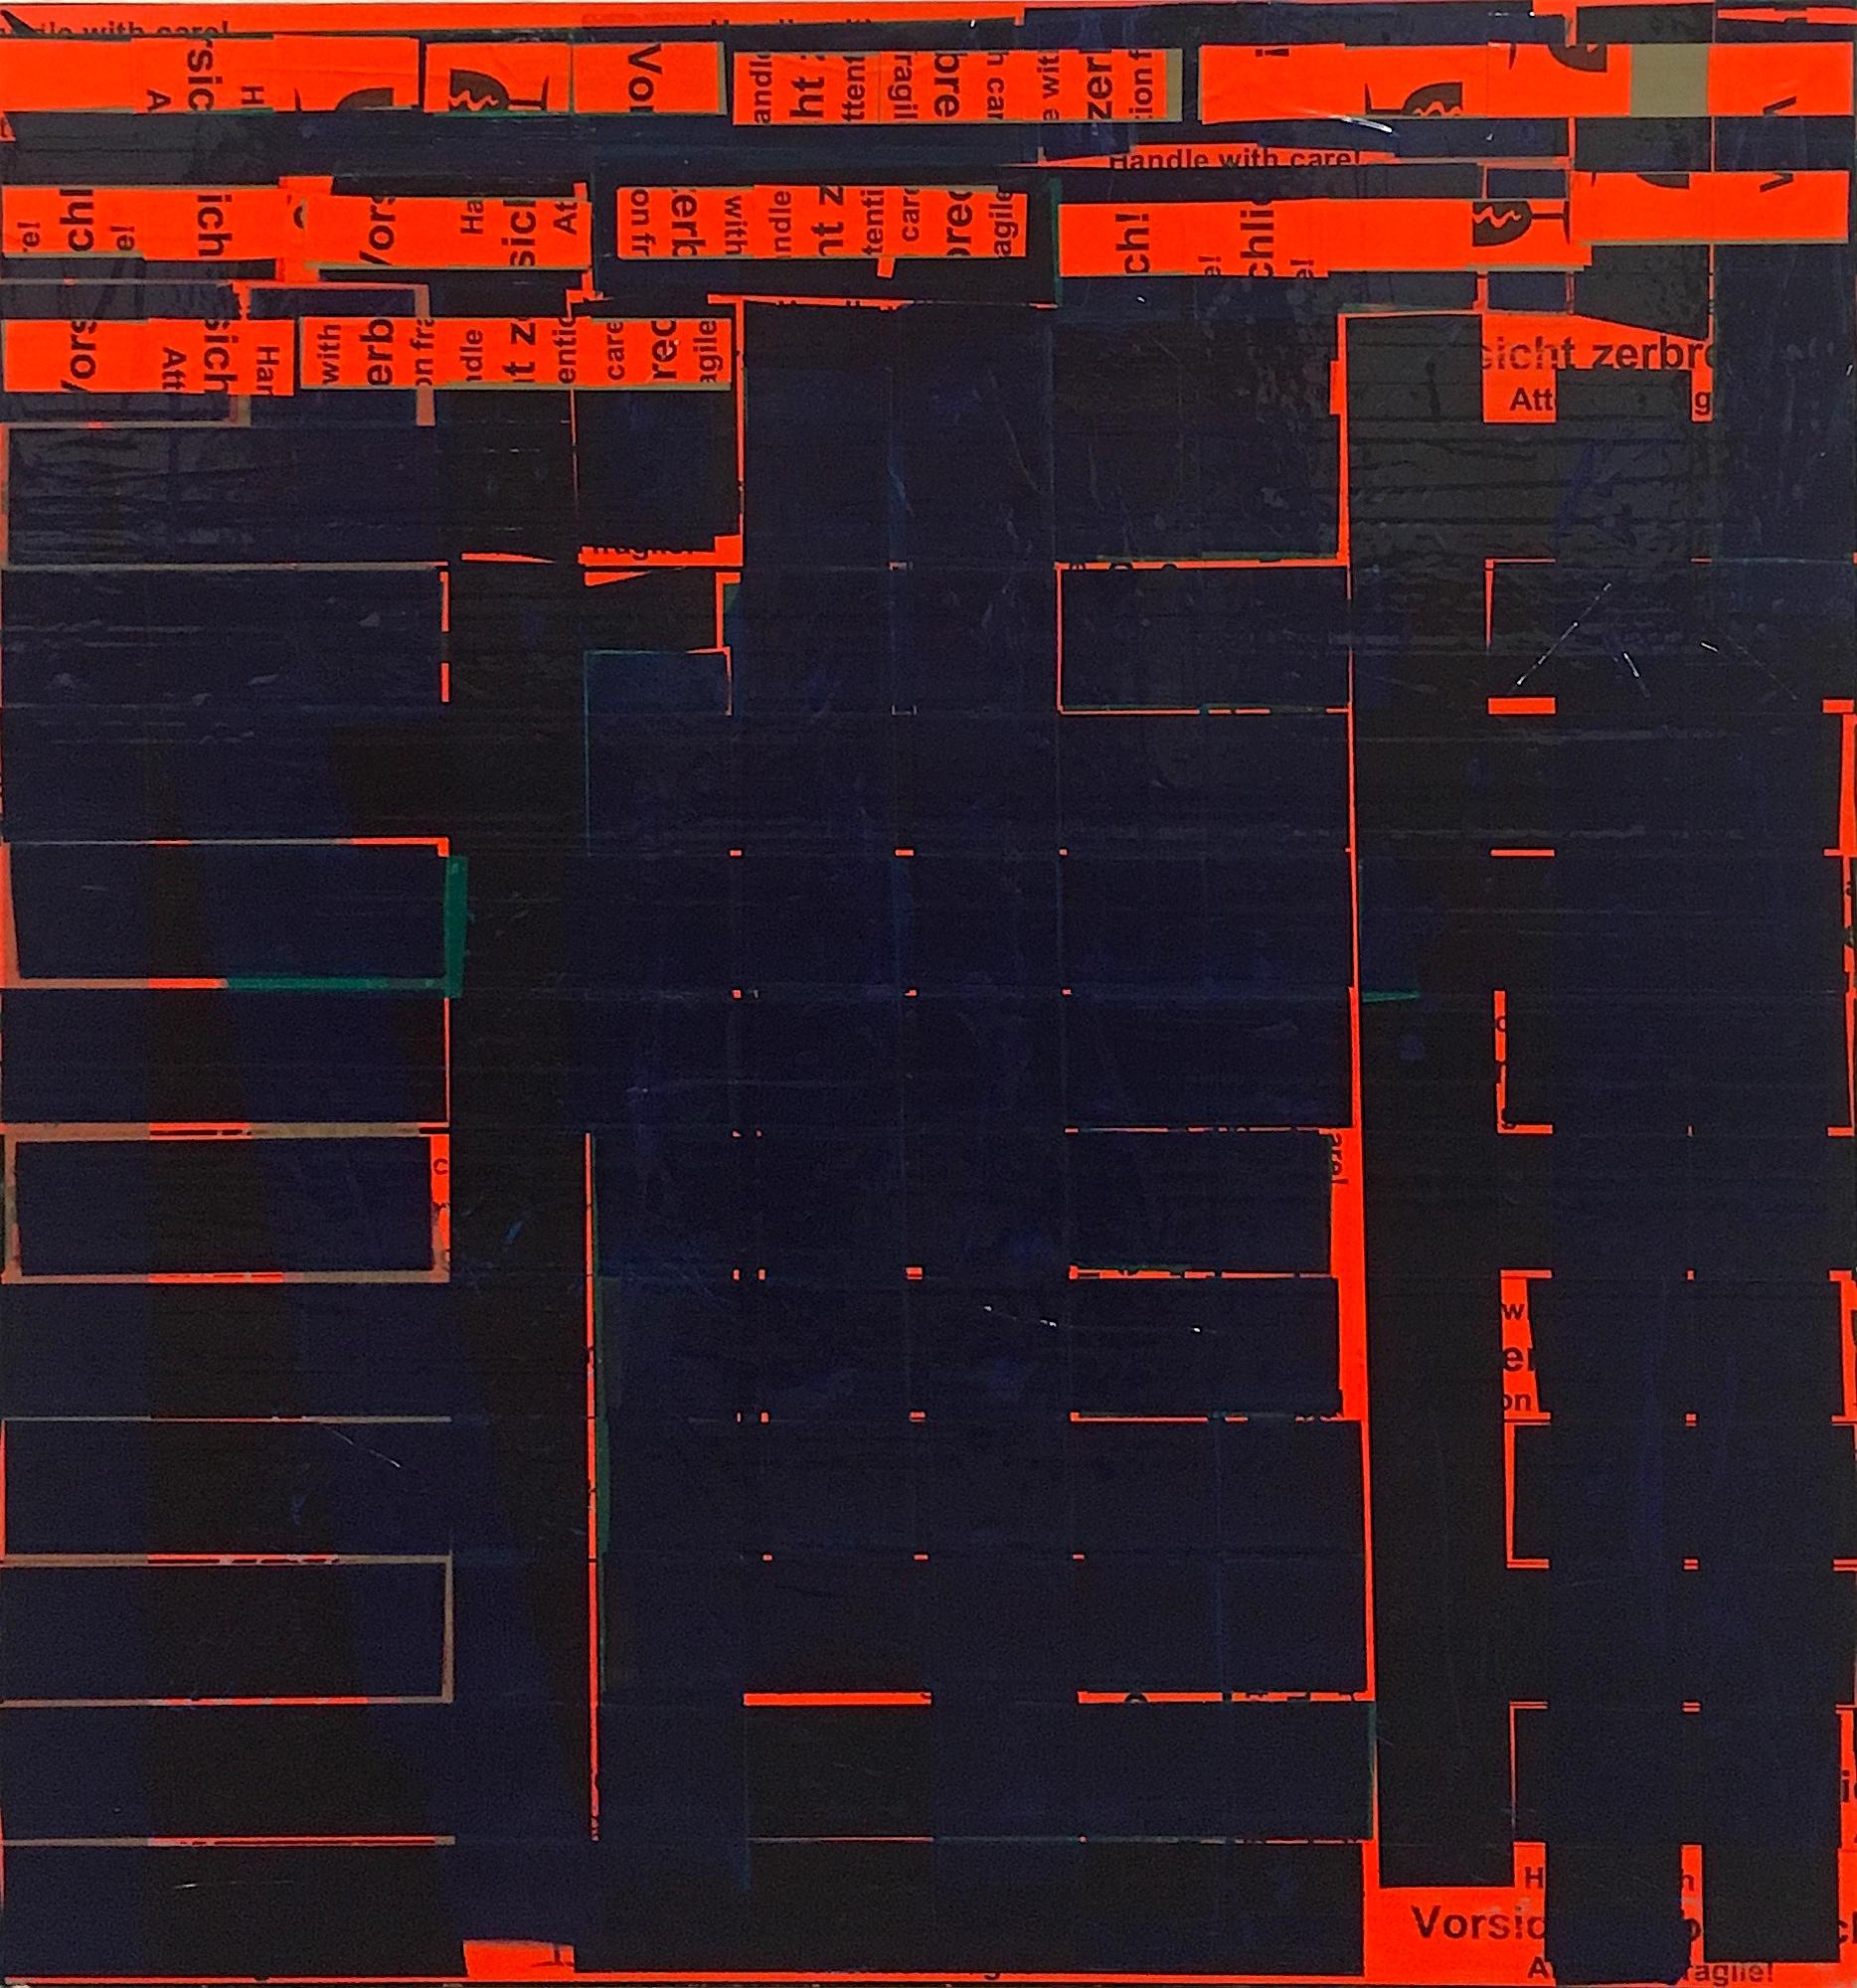 Melancholiker Oleksiy Koval, 2016 65 x 60 cm, tape on FPY